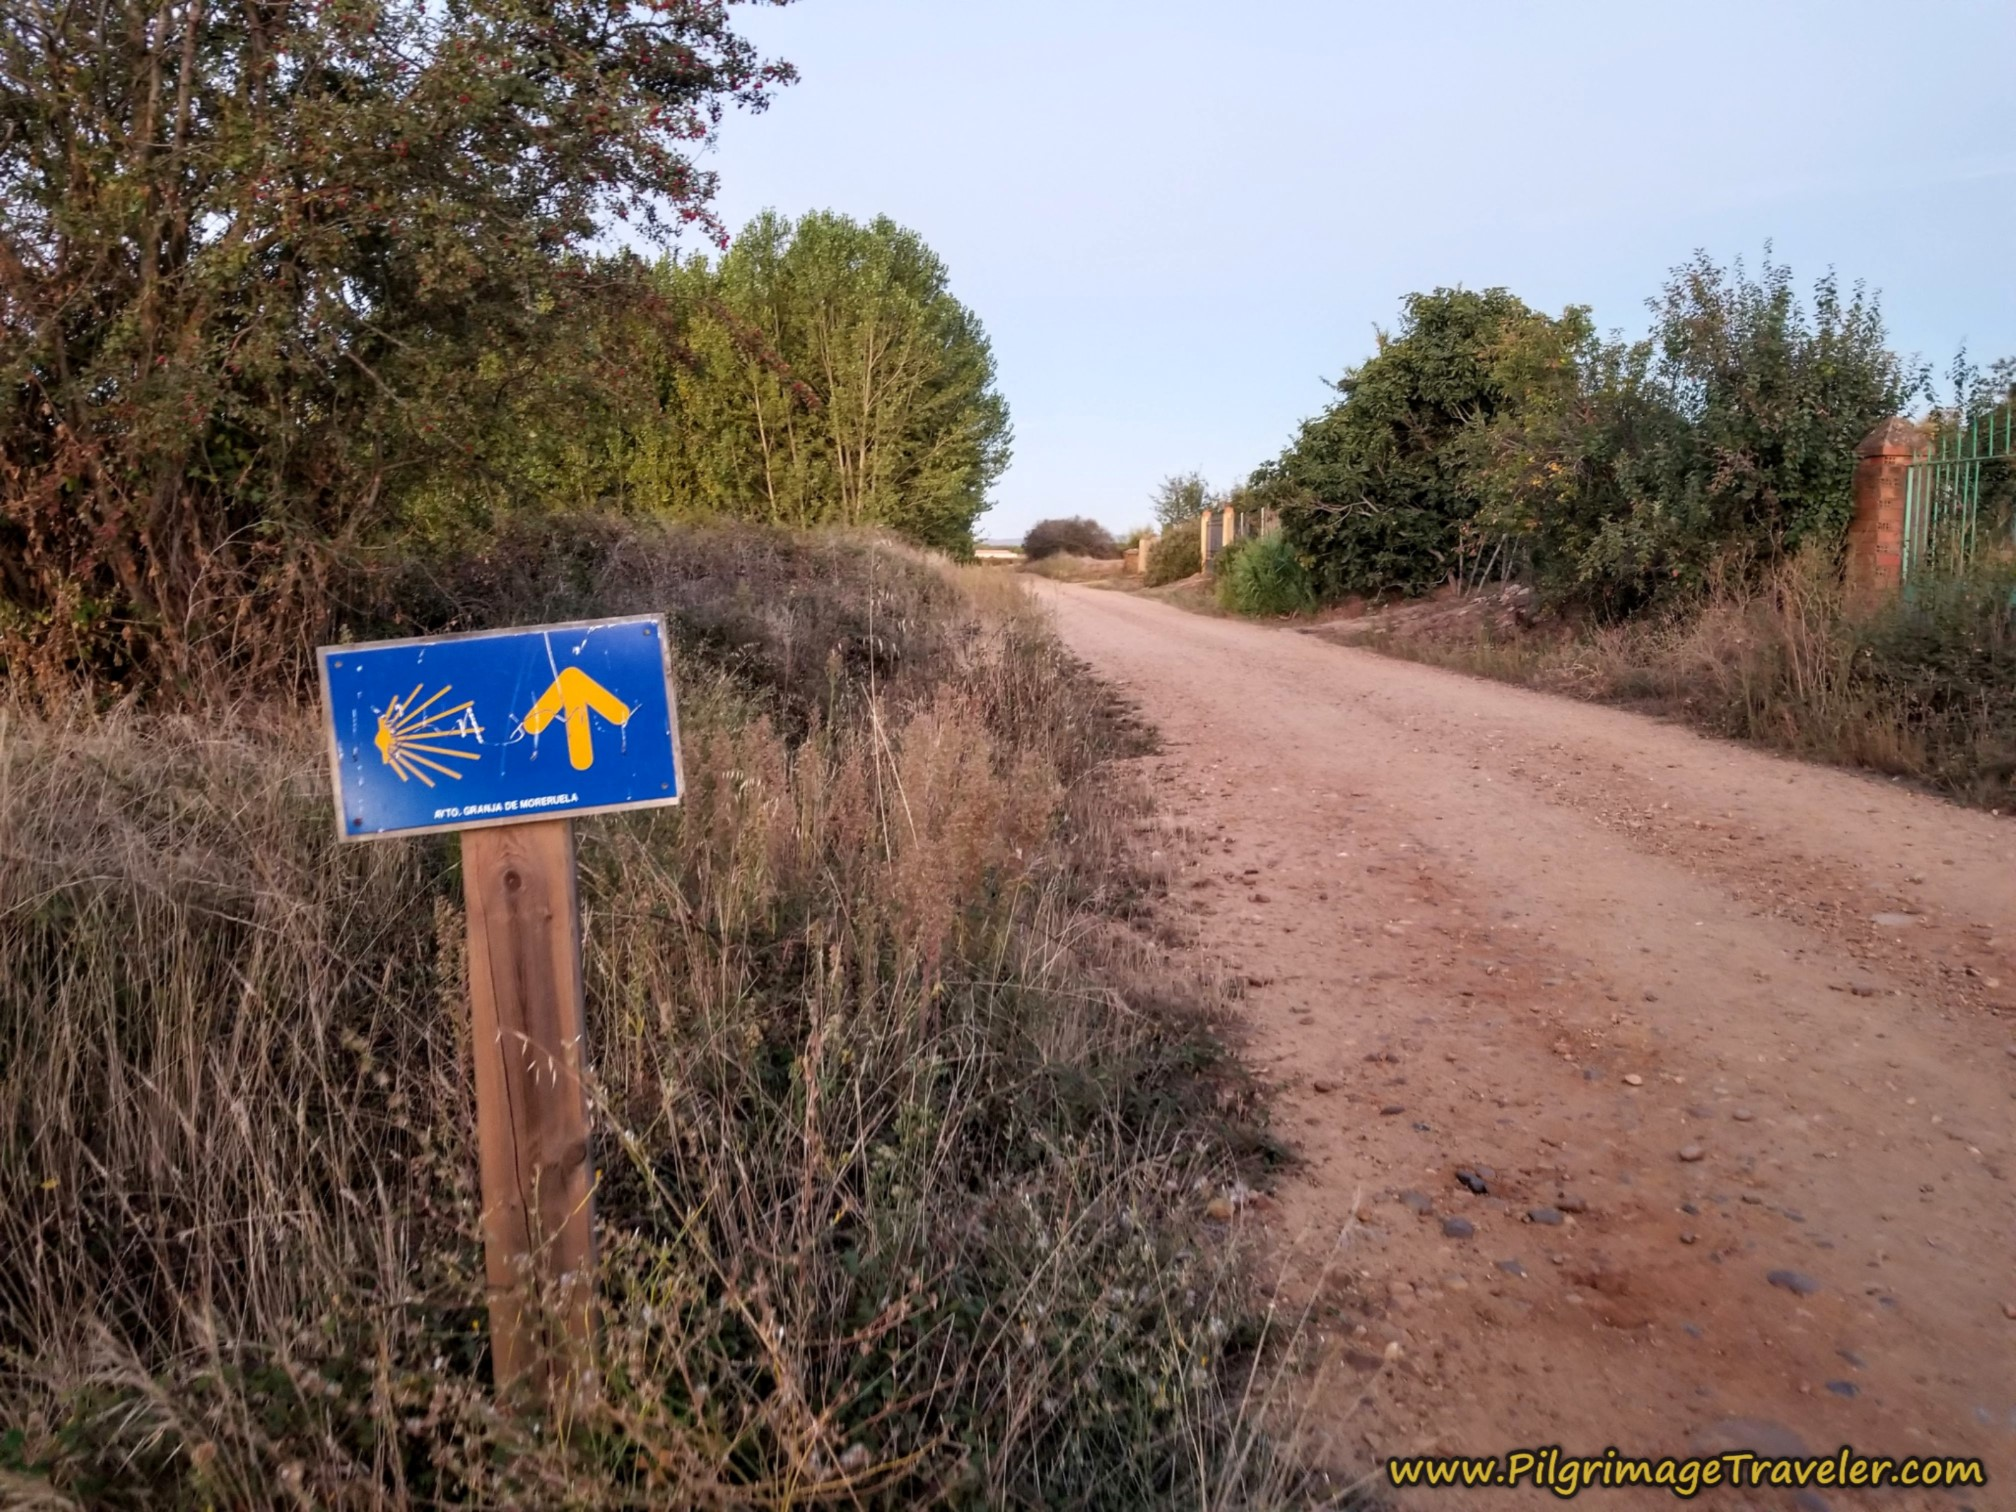 Road Ahead on the Camino Sanabrés from Granja de Moreruela to Tábara